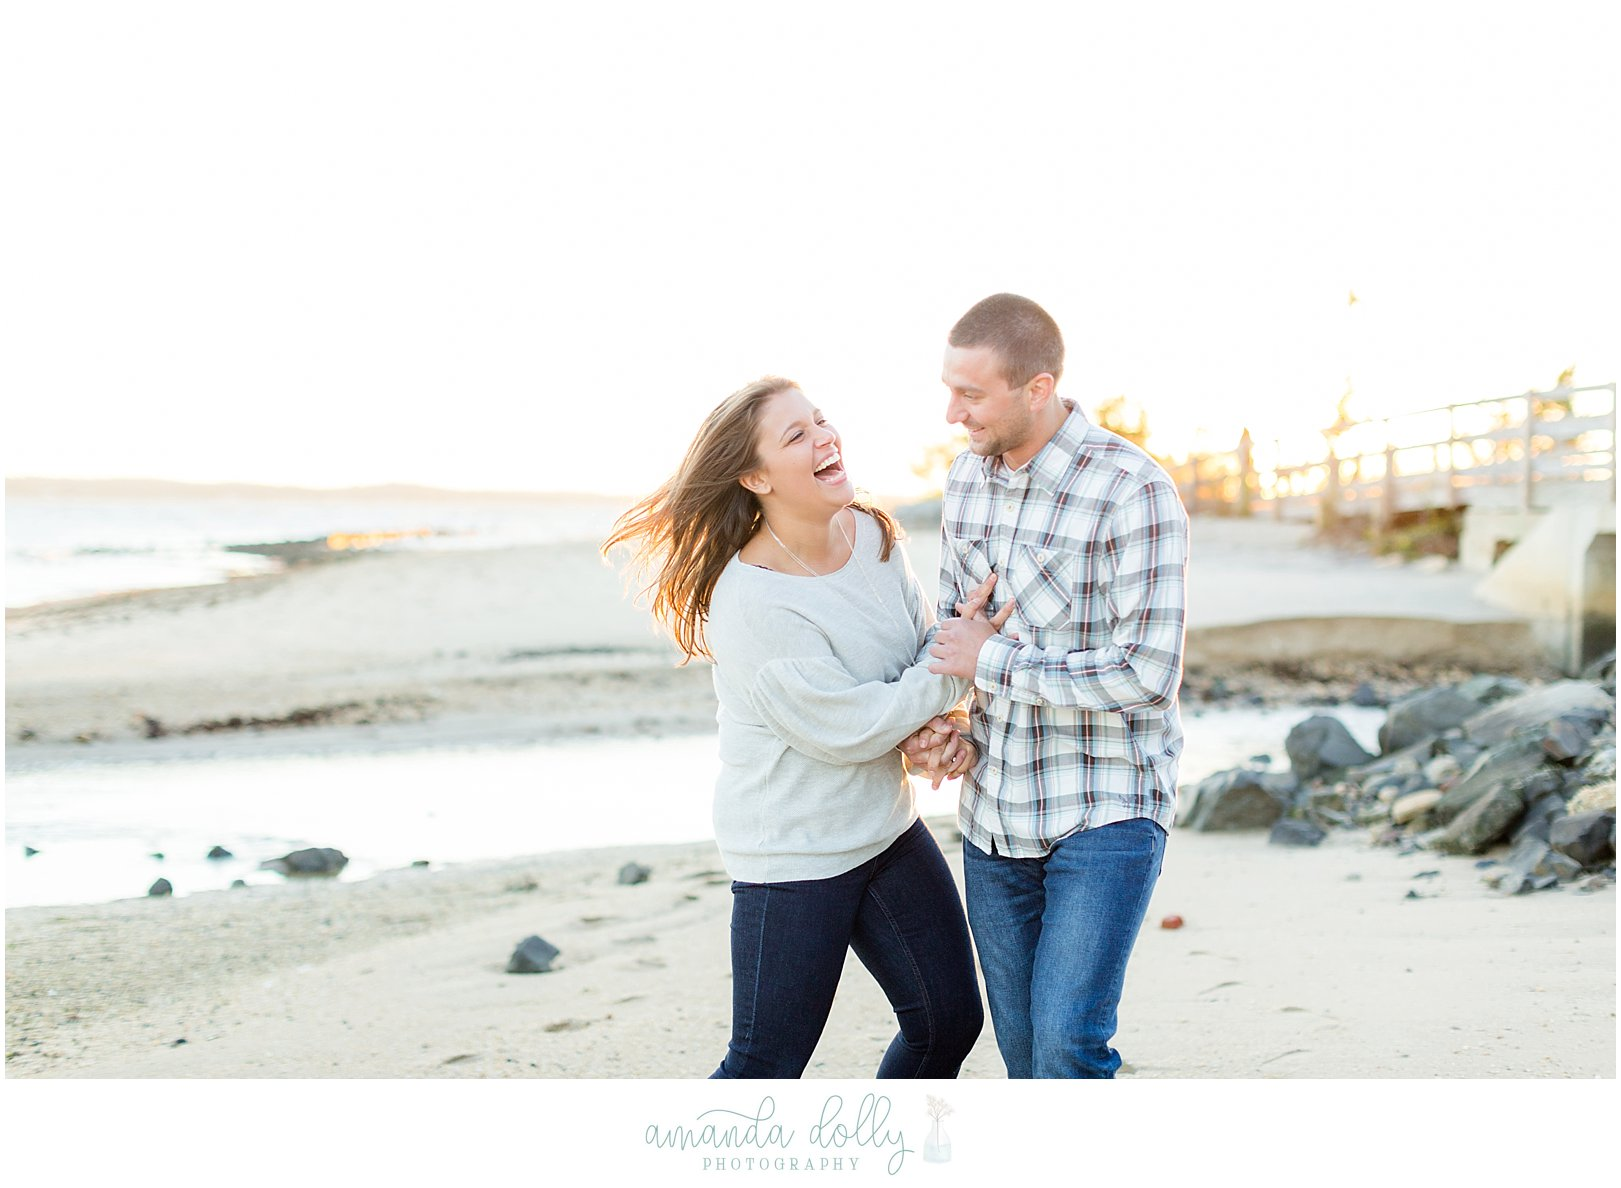 Sandy Hook Engagement Photography_0268.jpg